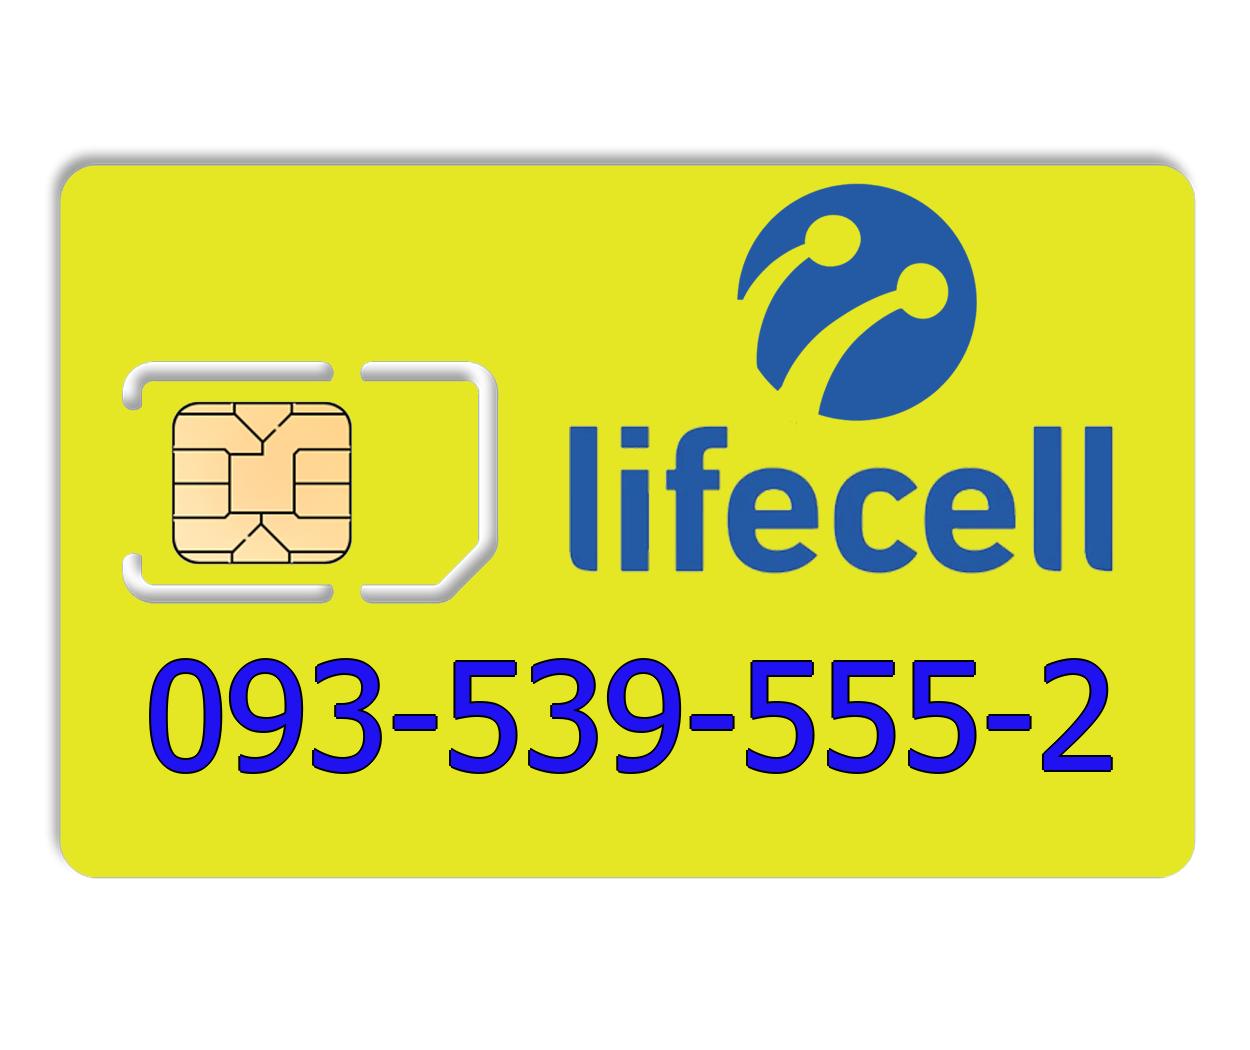 Красивий номер lifecell 093-539-555-2